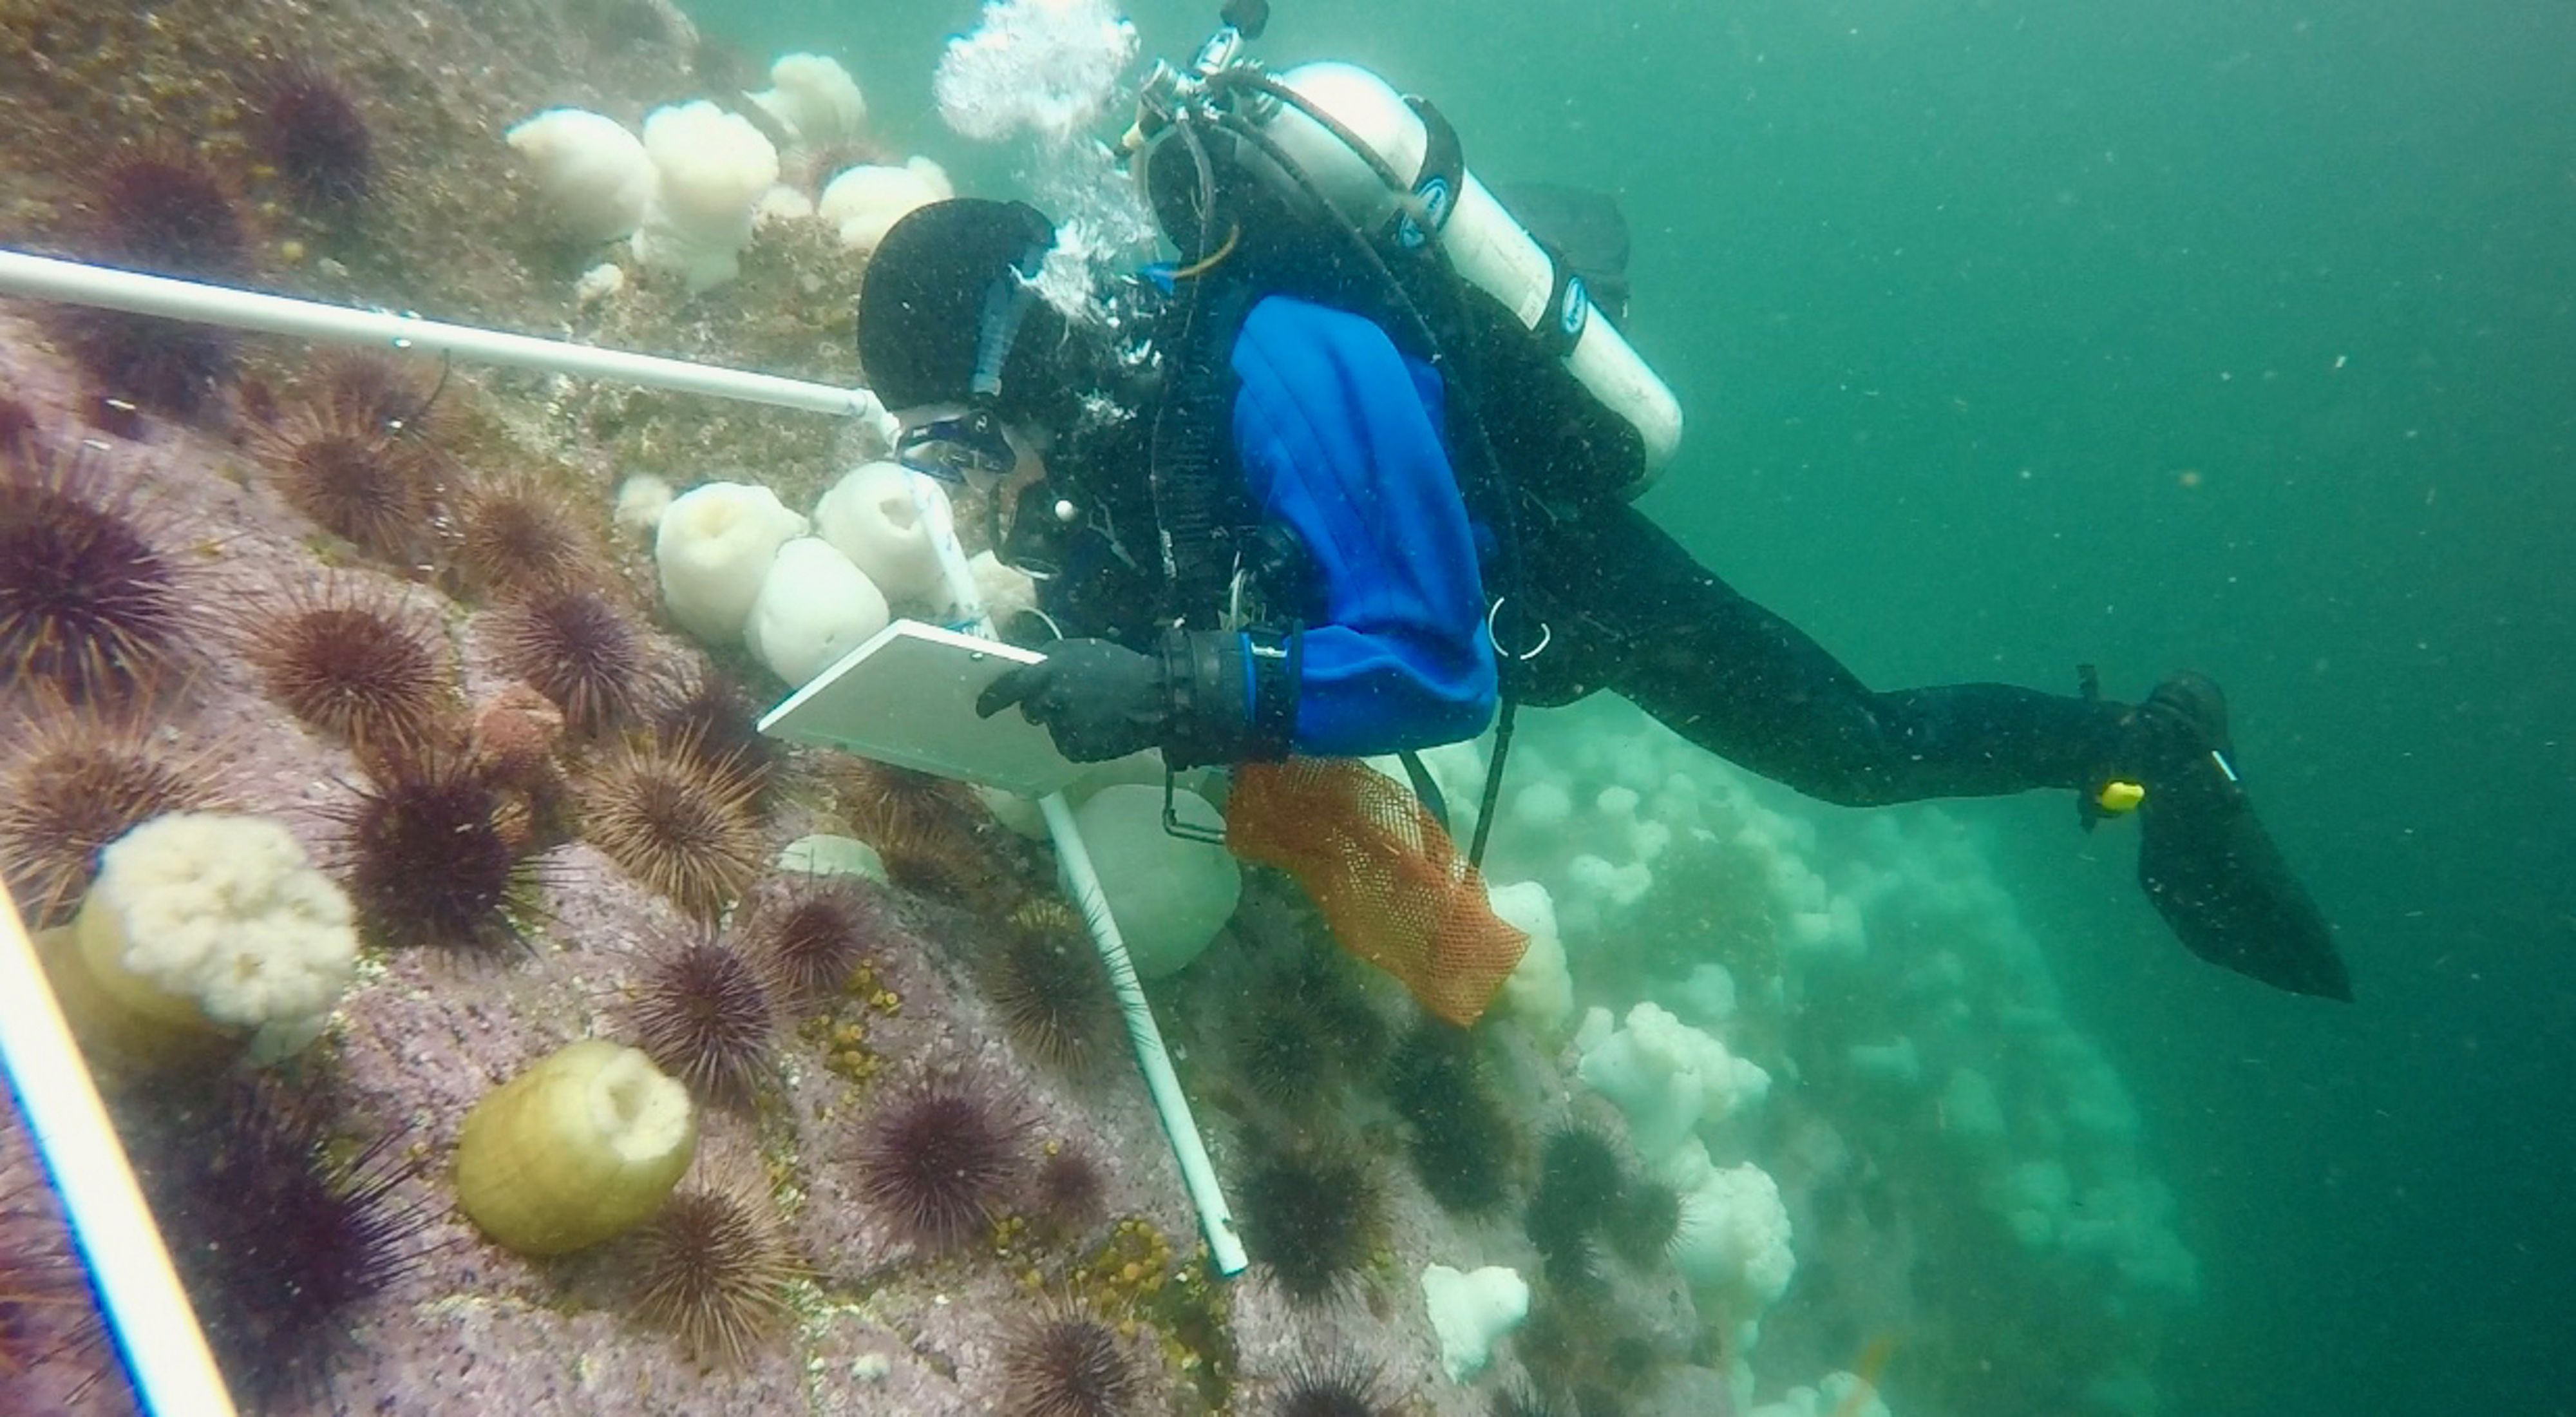 BC海洋部负责人Jenn Burt在大熊海水下进行了数不清的研究。